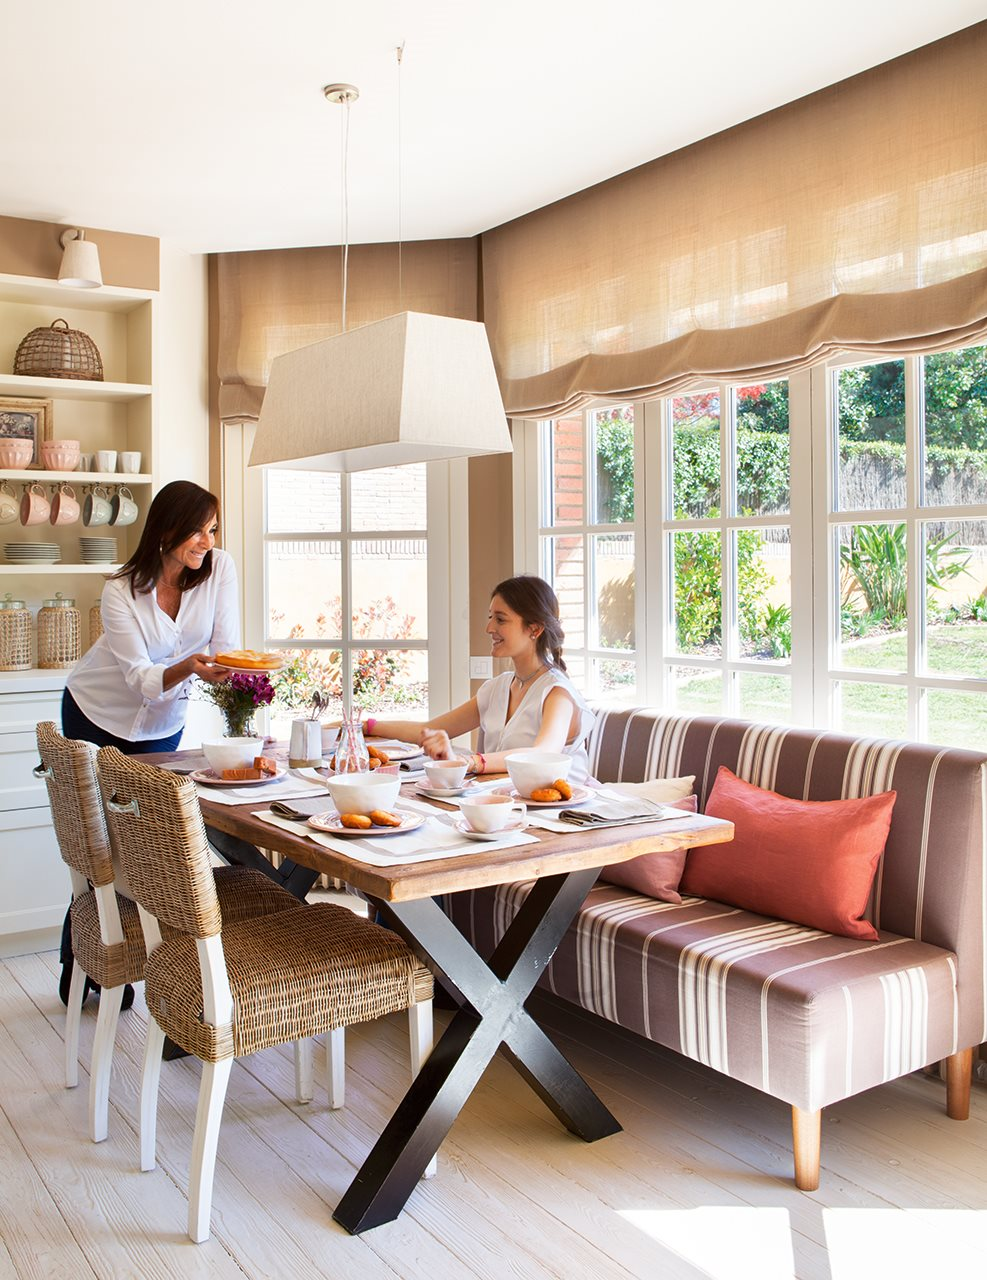 Una casa de inspiraci n estadounidense for Bancos para office cocina